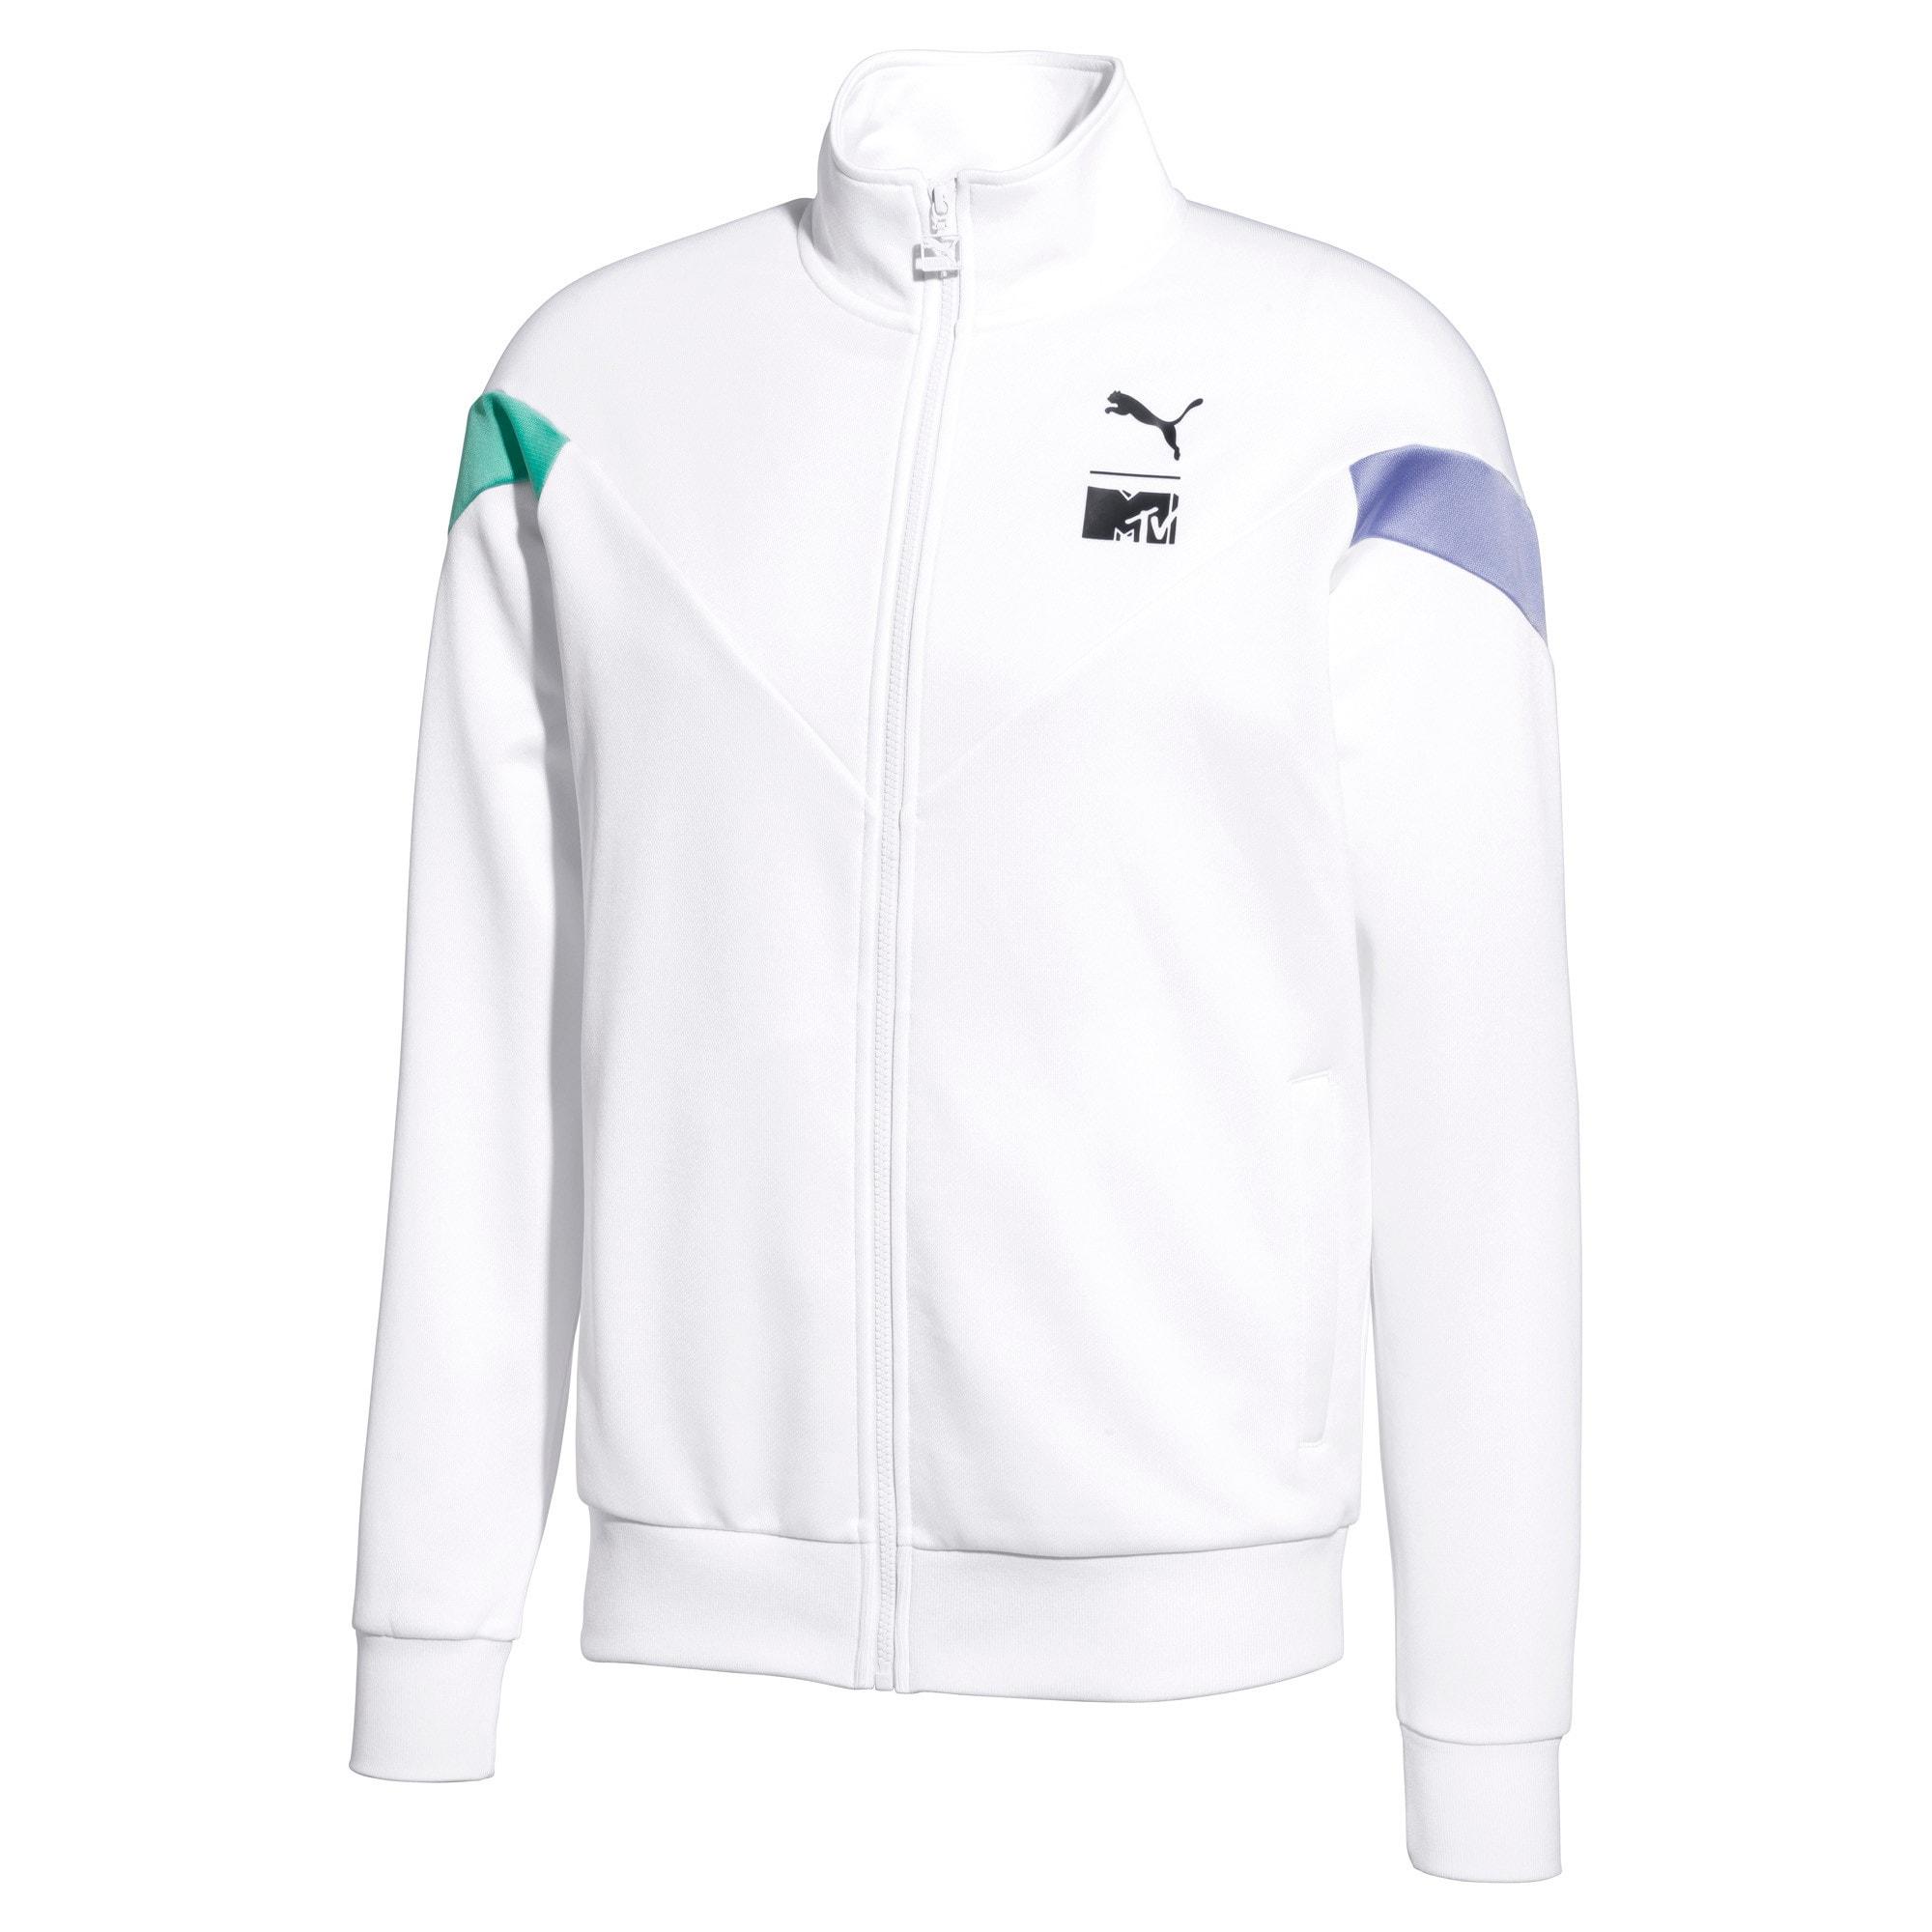 Thumbnail 1 of PUMA x MTV MCS Men's Track Jacket, Puma White, medium